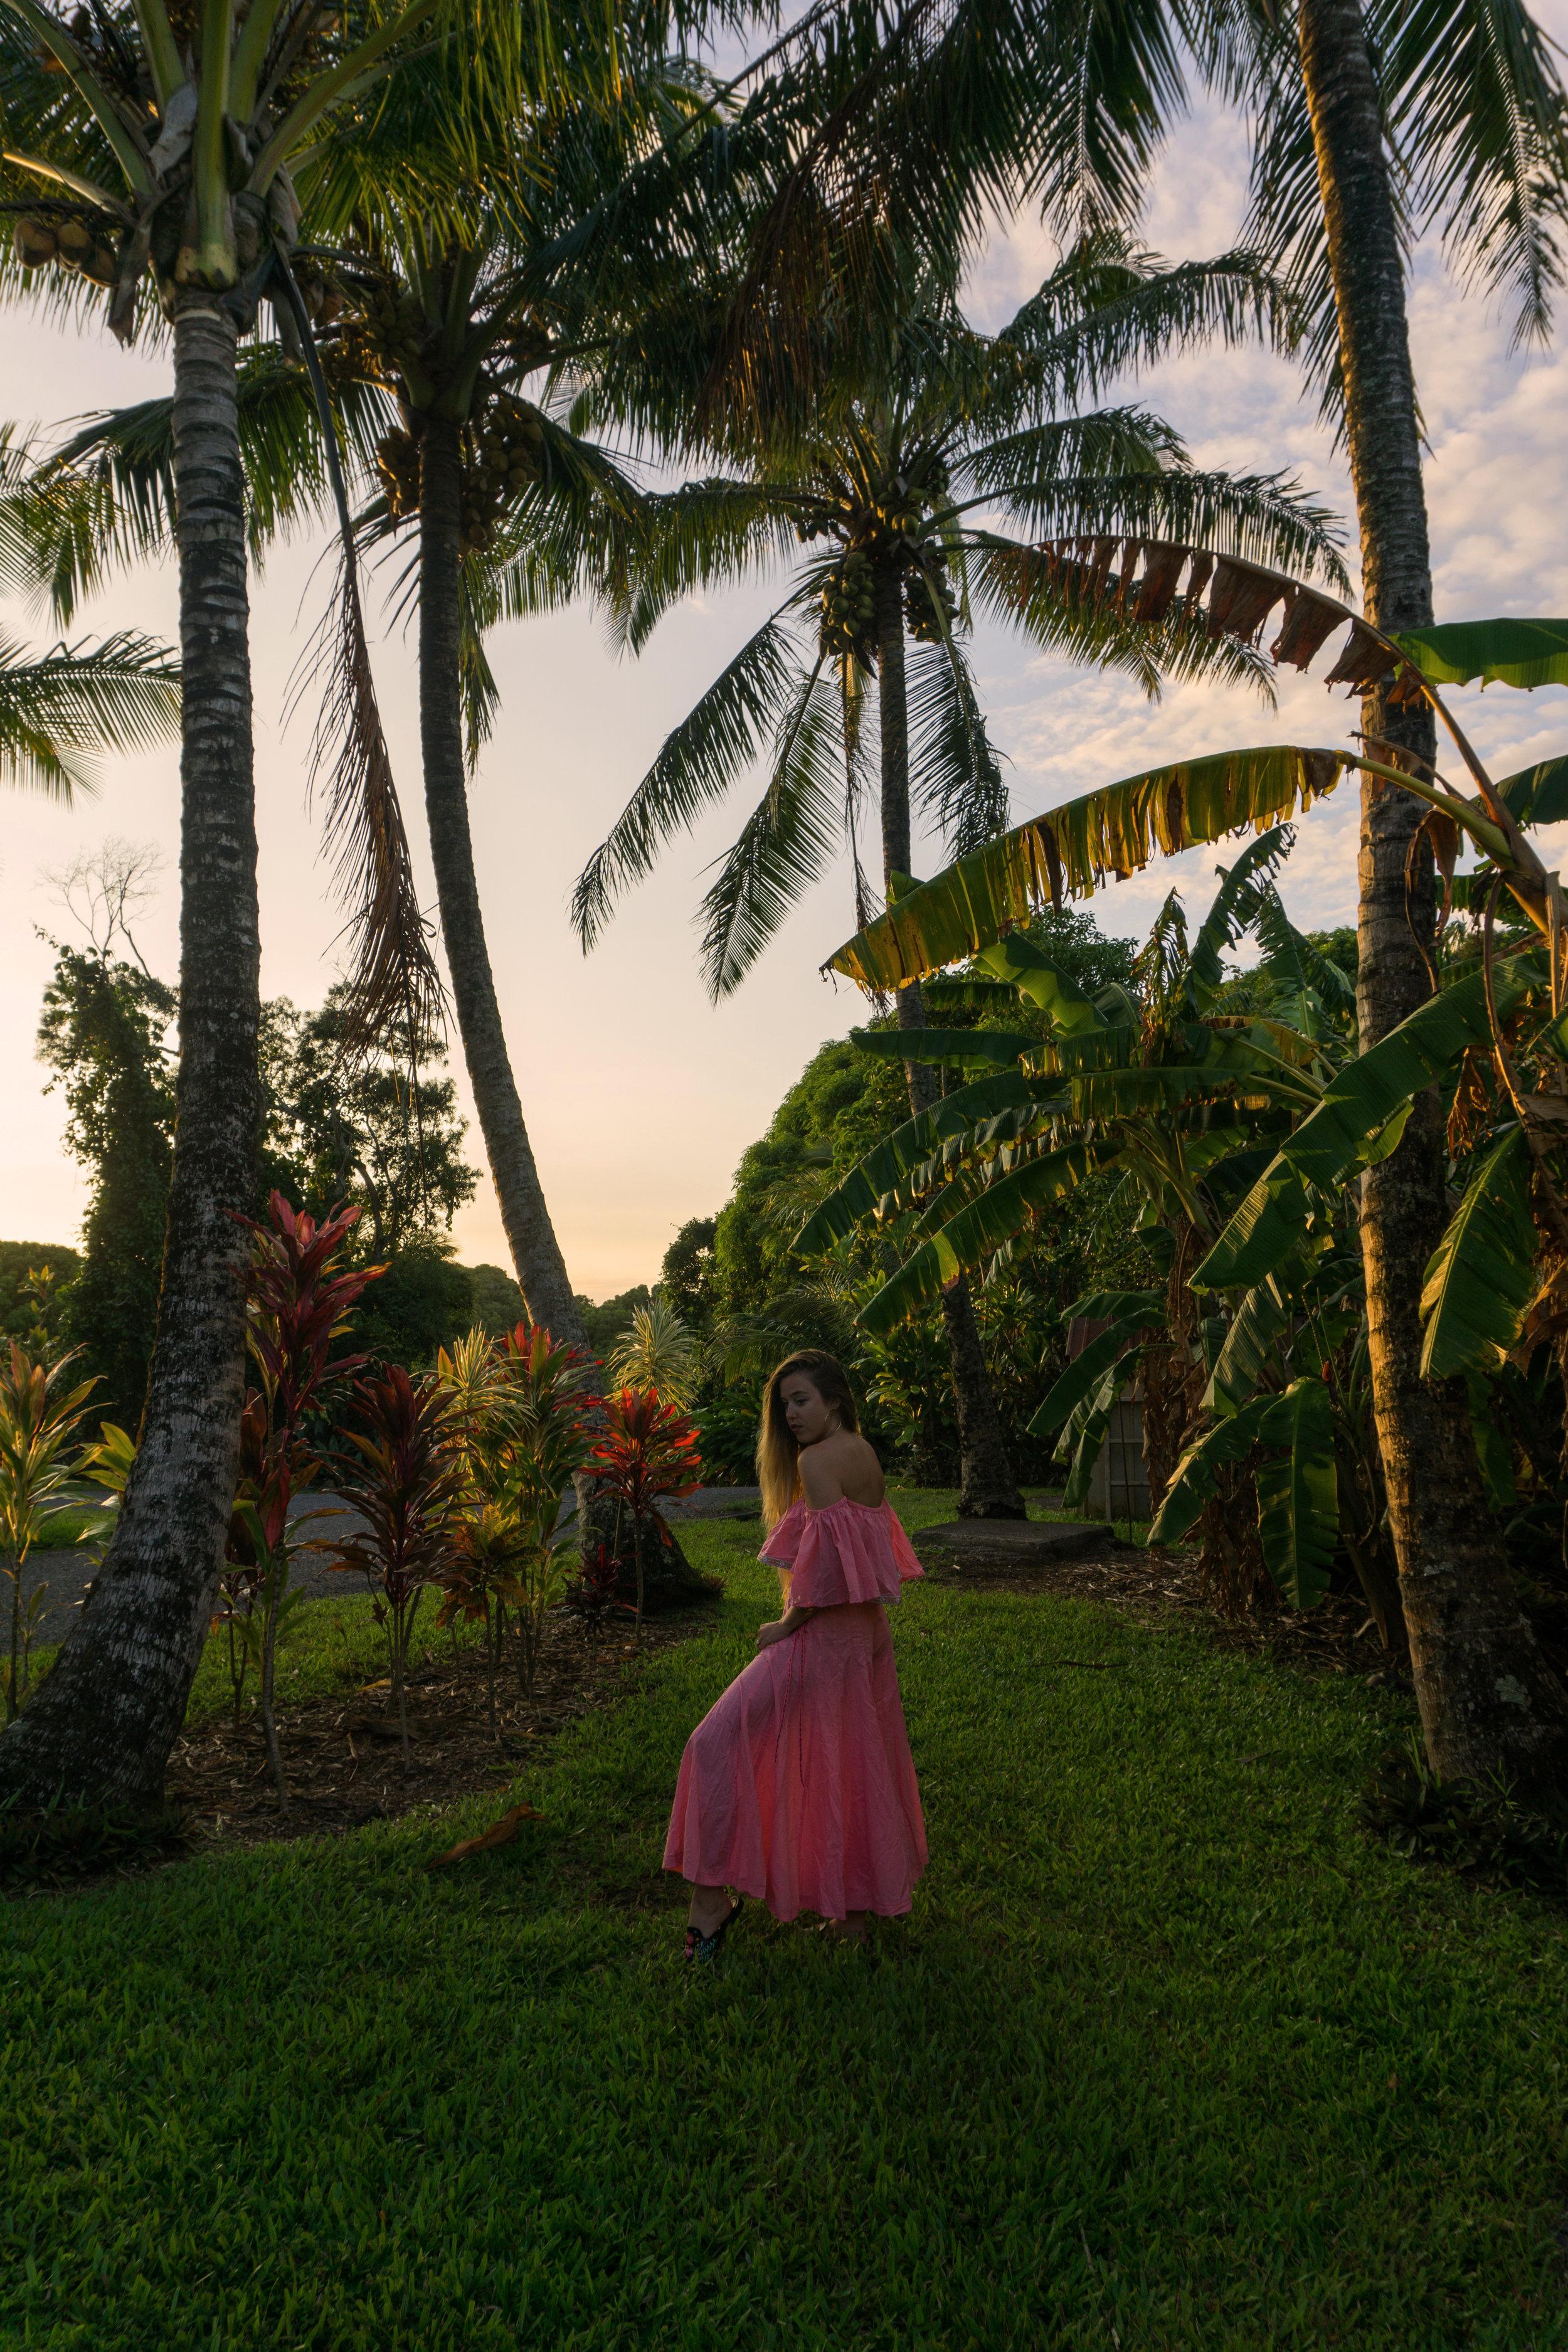 AstroBandit_Maui_Hawaii_JordanRose_NorthShore_8.jpg